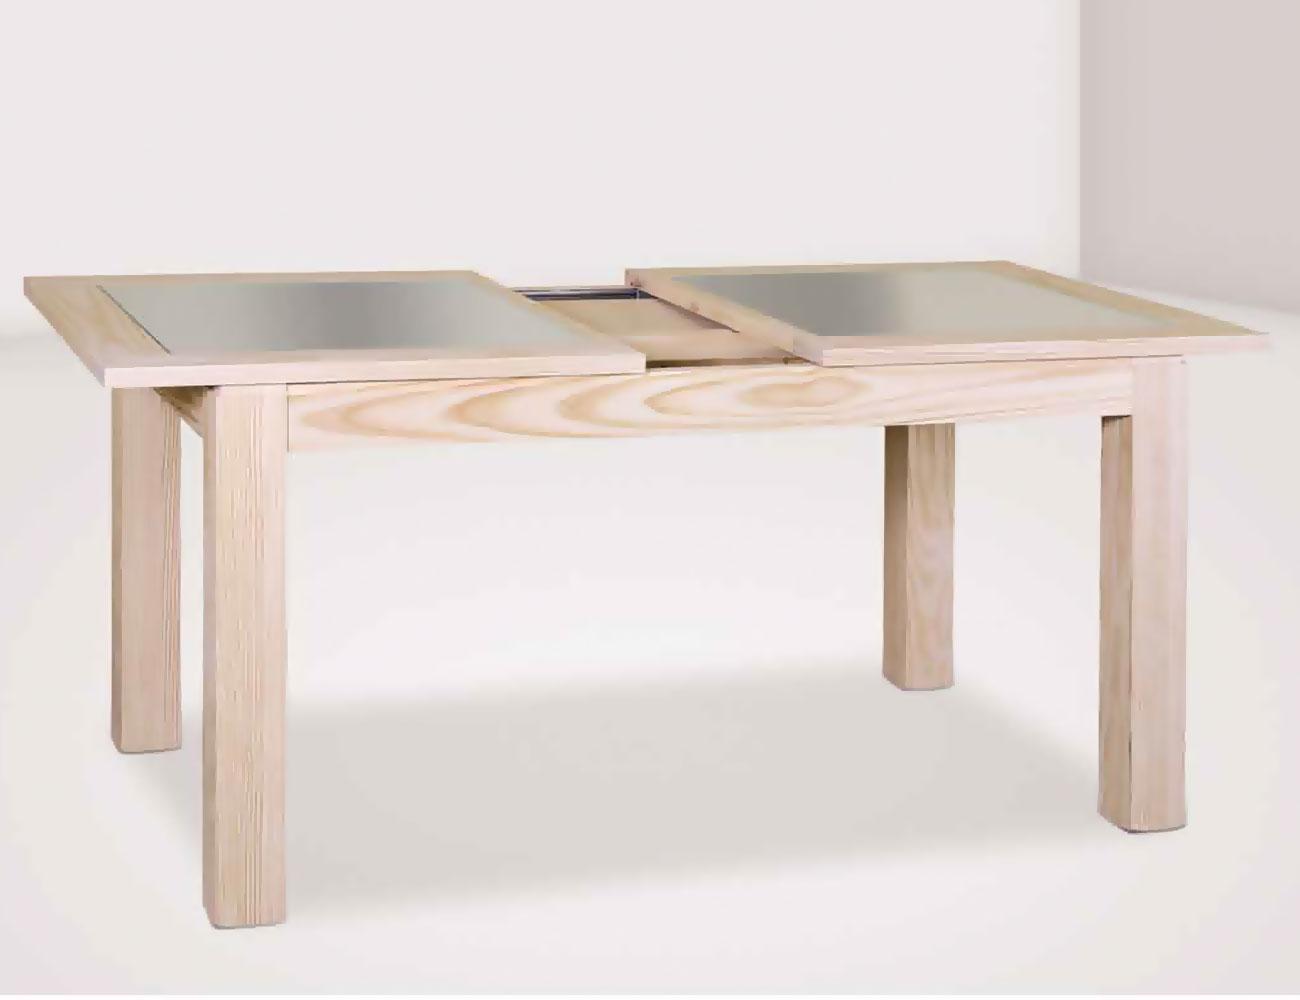 Mesa comedor fija 140 cm en madera con tapa cristal en for Mesa comedor cristal 200 cm